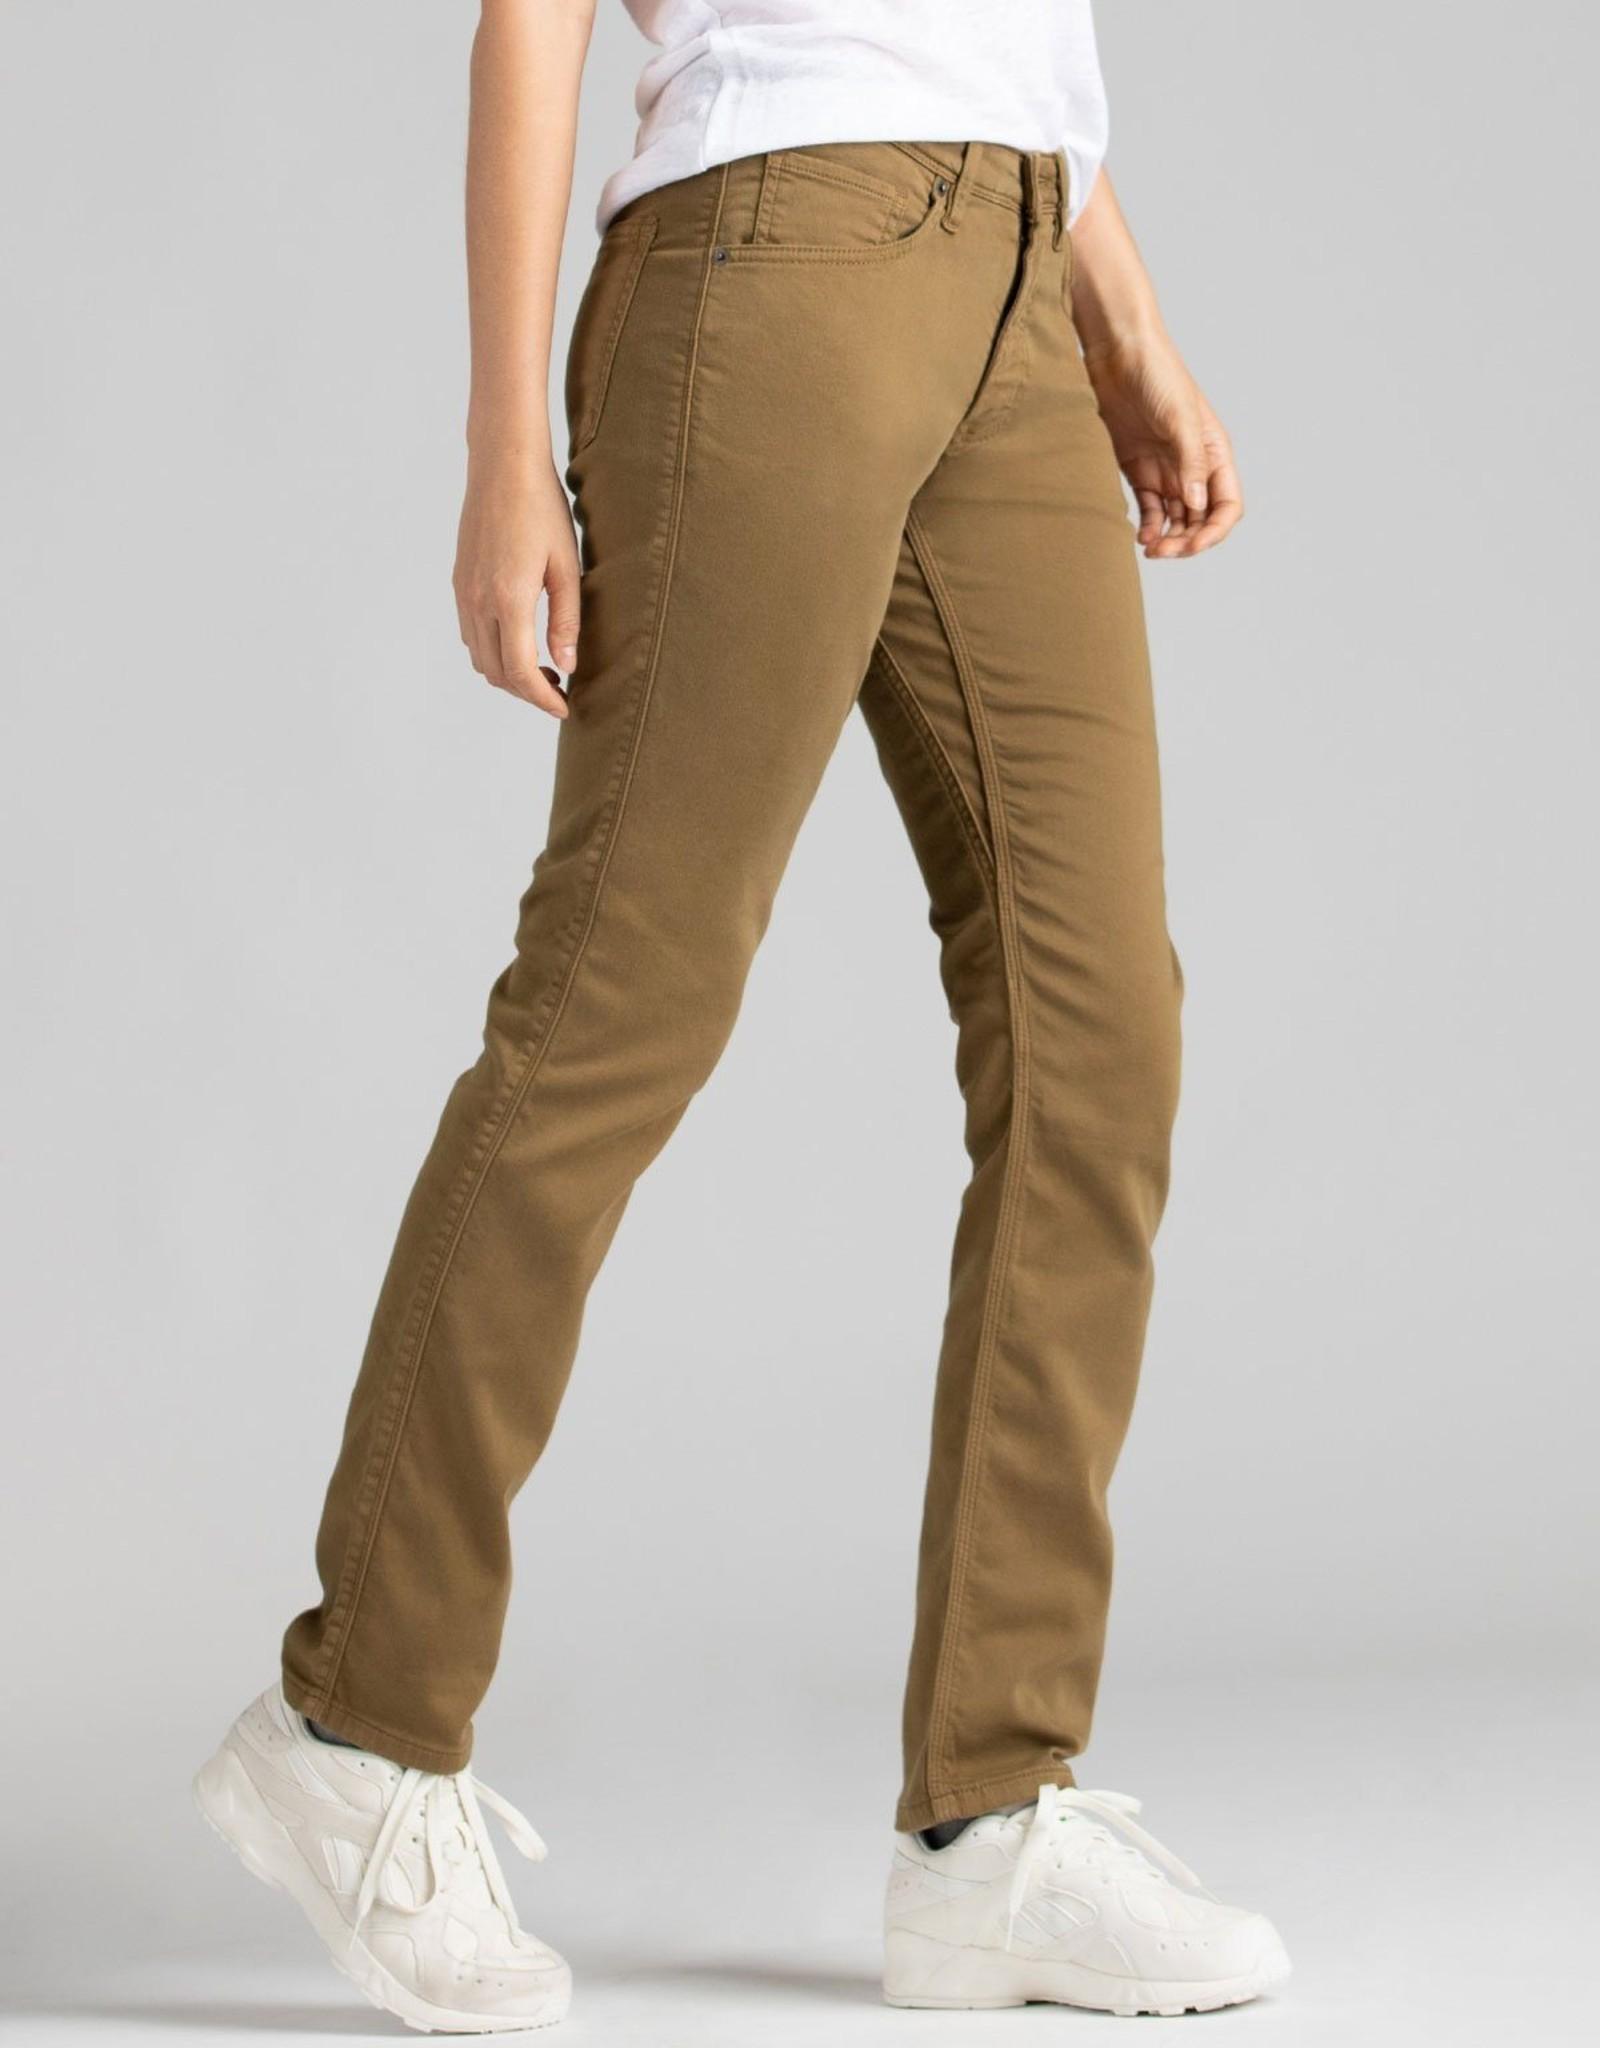 DU/ER WOMEN'S DU/ER NO SWEAT SLIM STRAIGHT PANT-TOBACCO